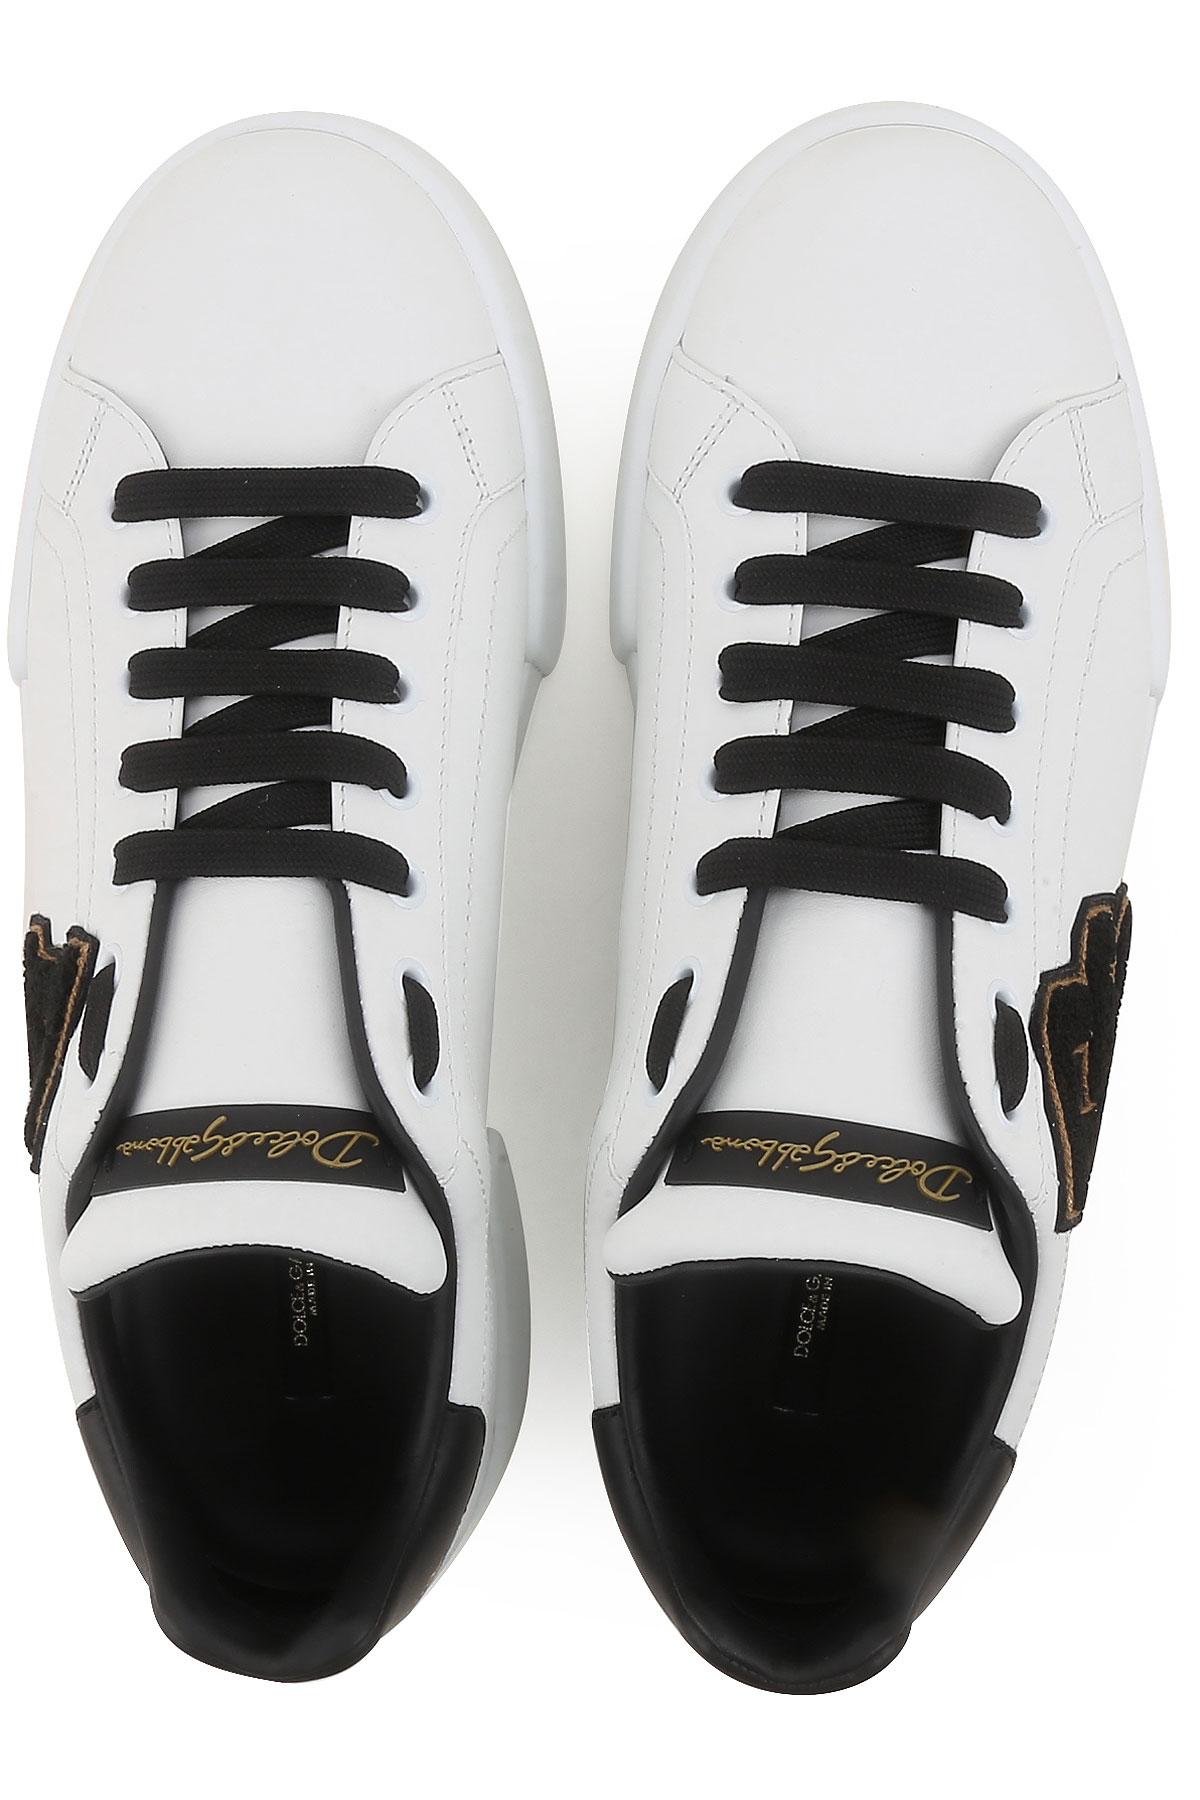 verano Dolce Hombres Gabbana amp; Negro Blanco Zapatos Para 2019 Primavera ZnqgwZrCv